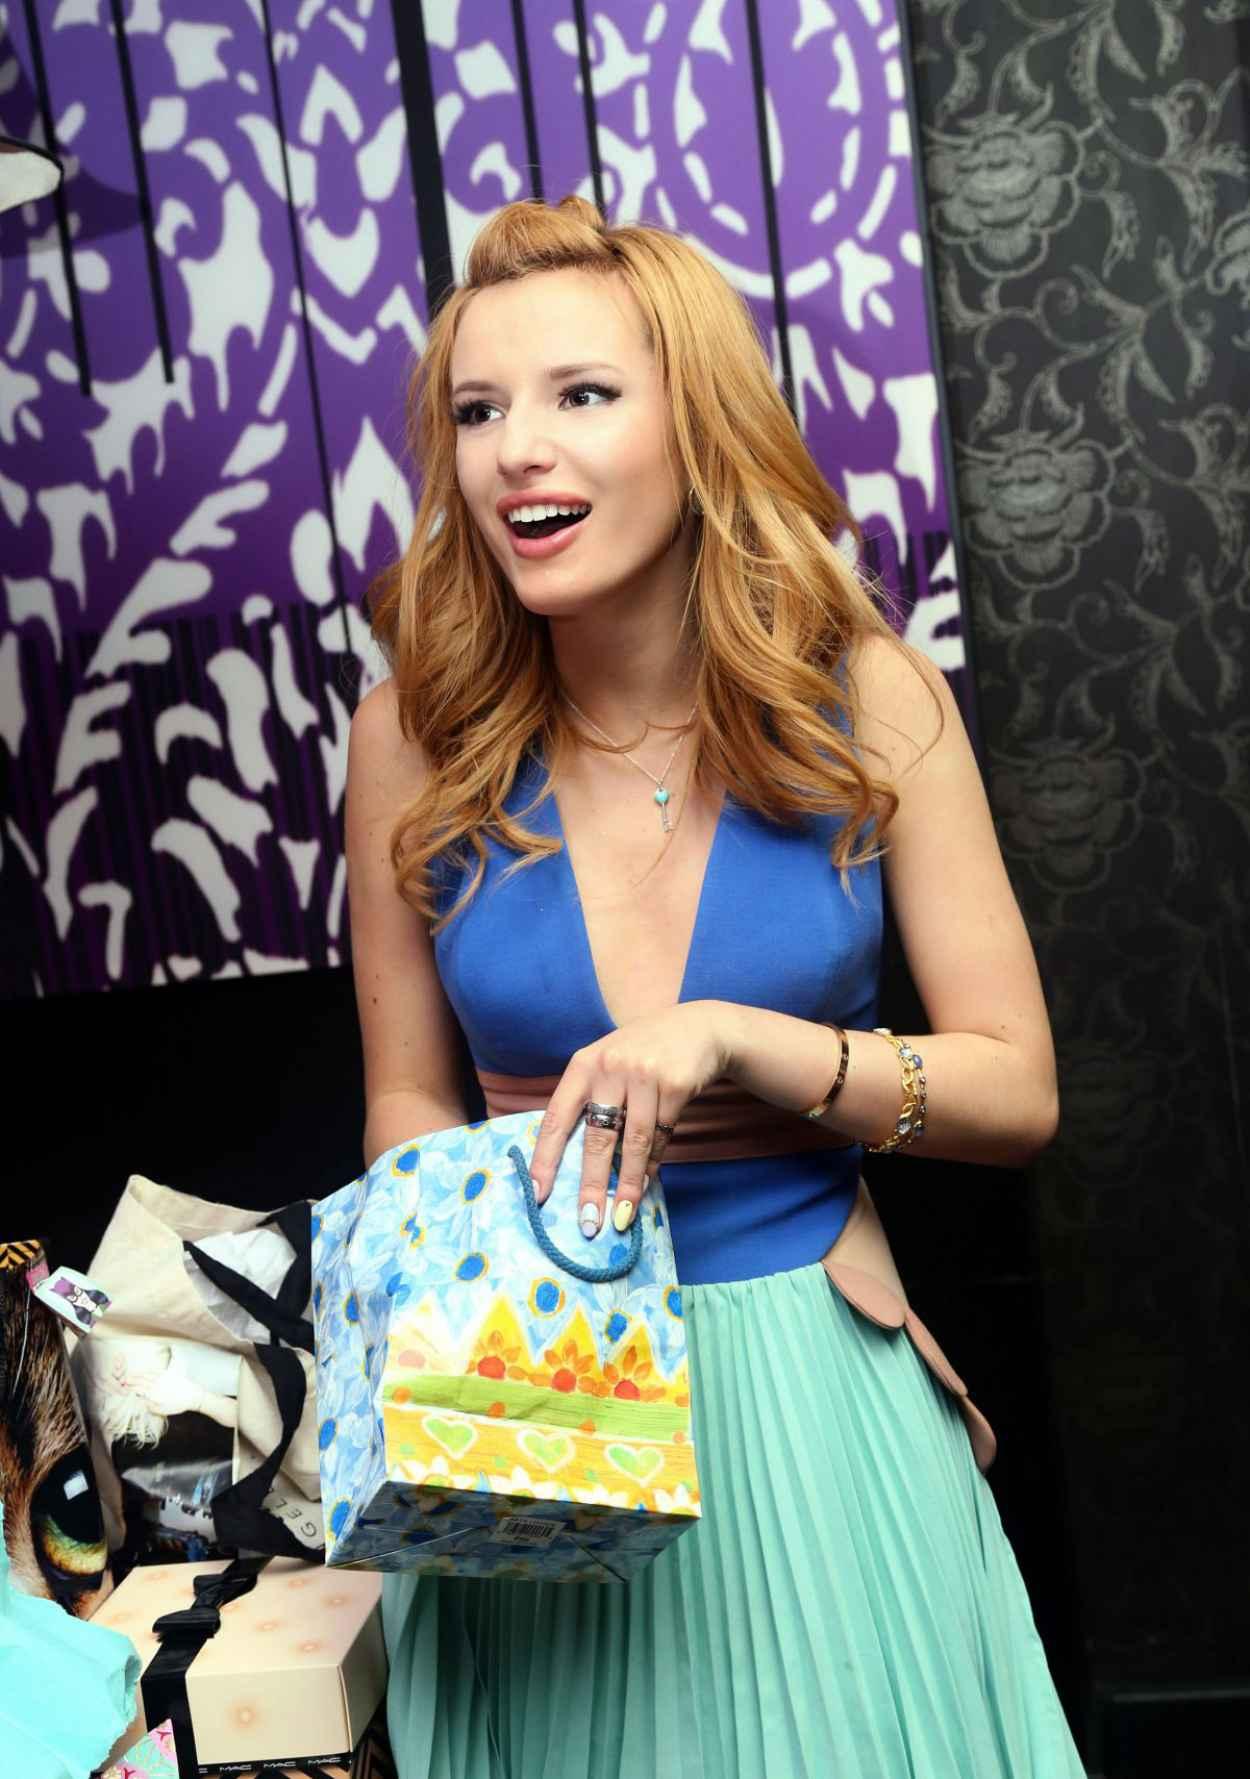 Bella Thorne Celebrates Her 16th Birthday at STK Restaurant in Los Angeles-1